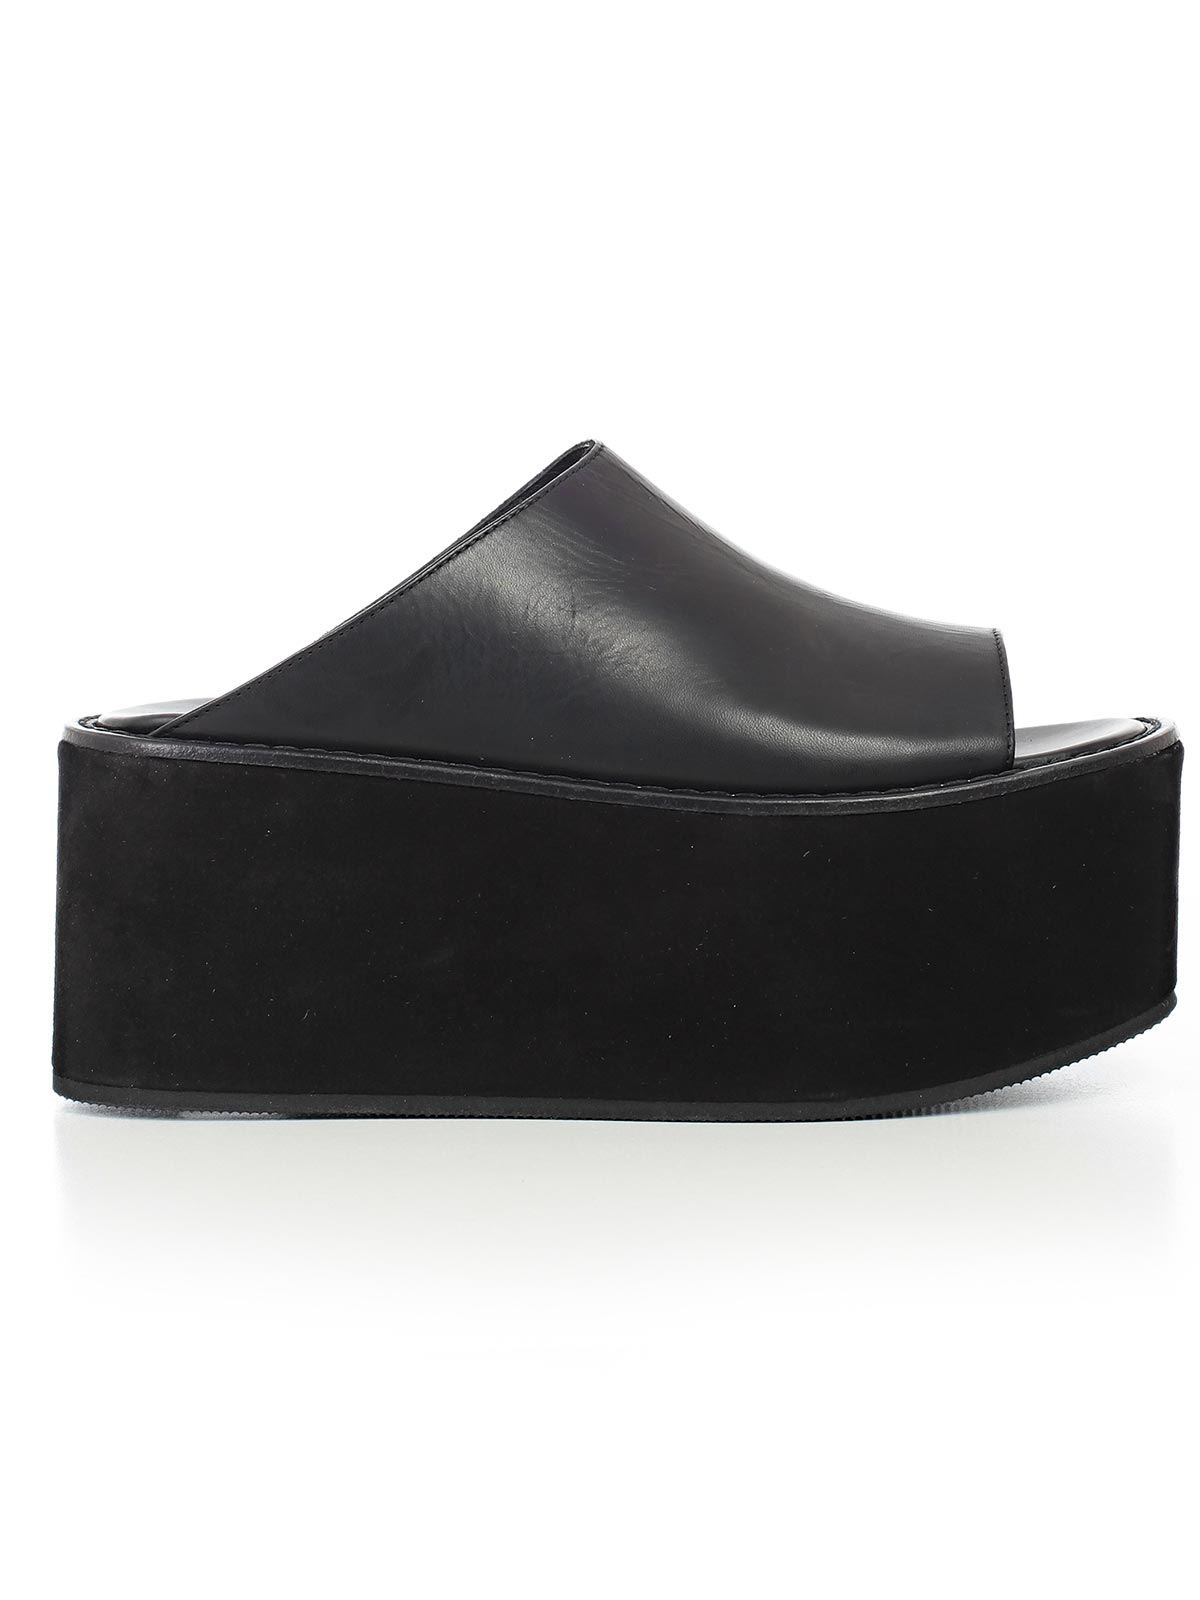 Picture of Ann Demeulemester Footwear